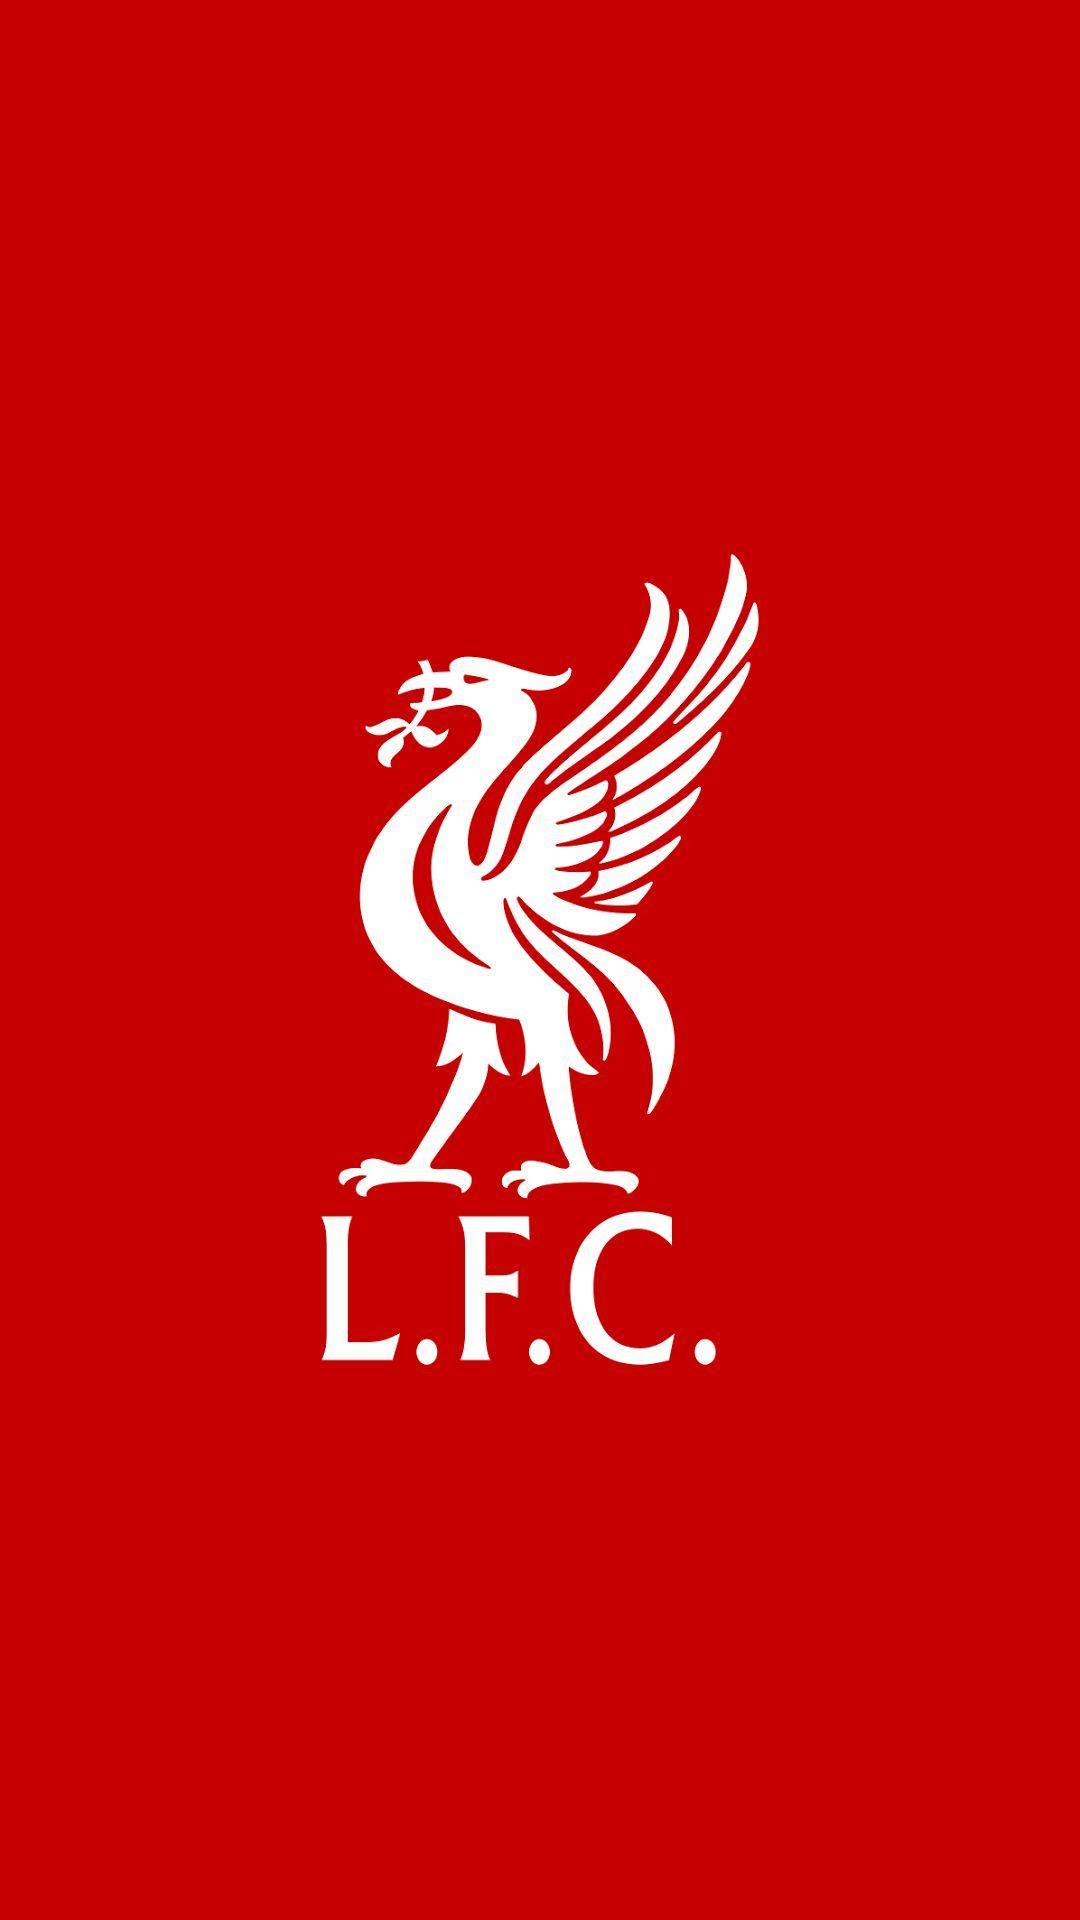 Wallpapers Logo Liverpool 2017 - Wallpaper Cave